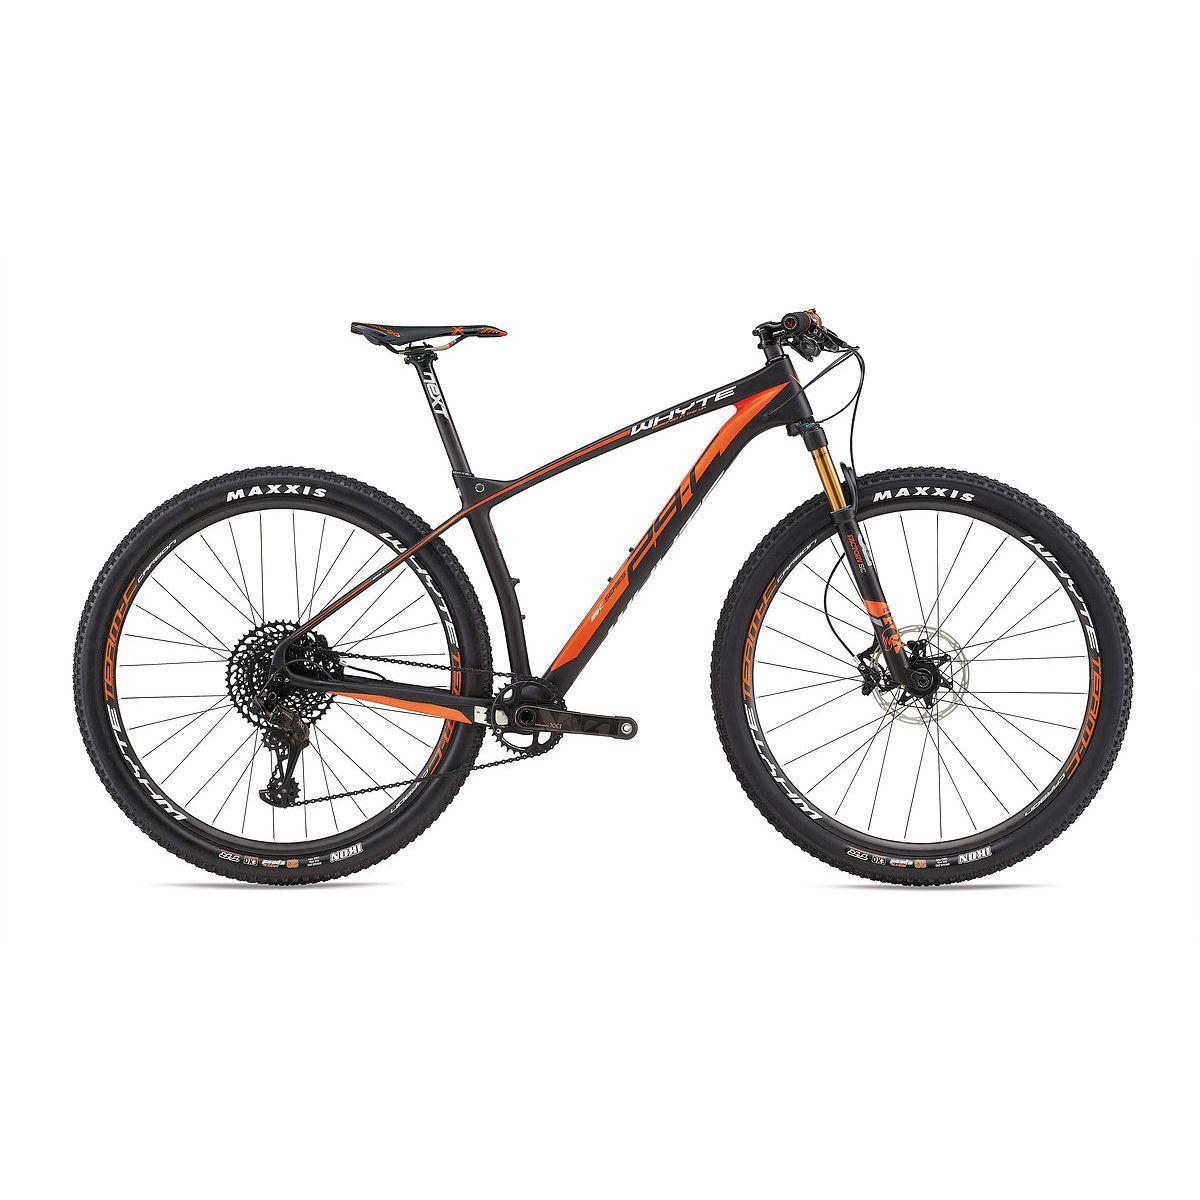 Whyte 29-C 2017 Team Hardtail Mountain Bike Black Orange | BICYCLE ...